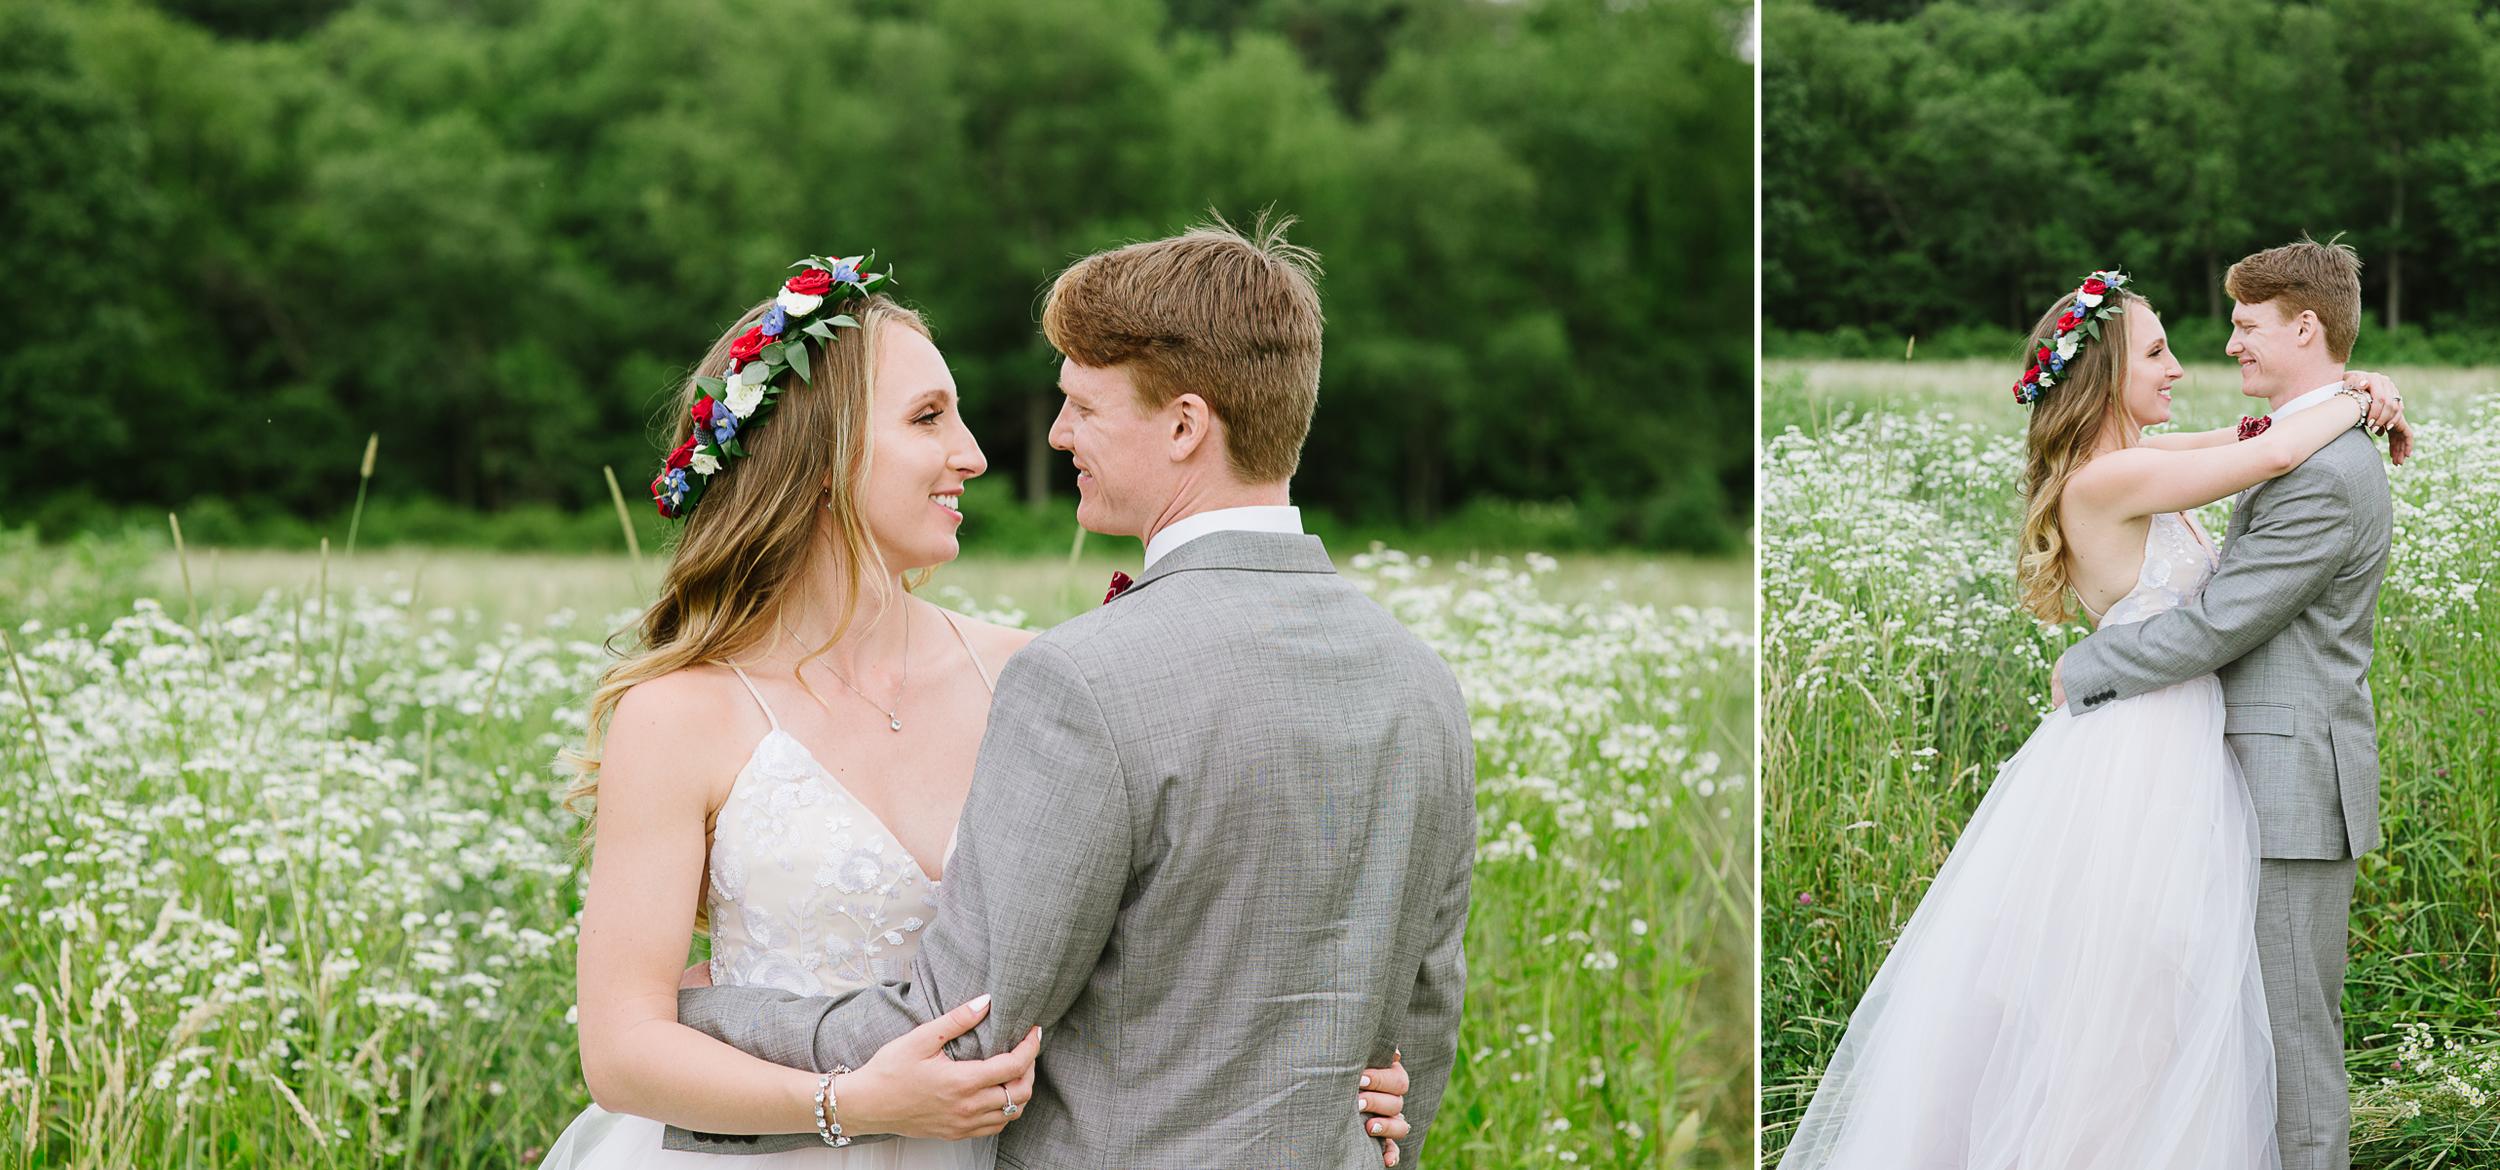 lingrow farm wedding portraits mariah fisher photography.jpg